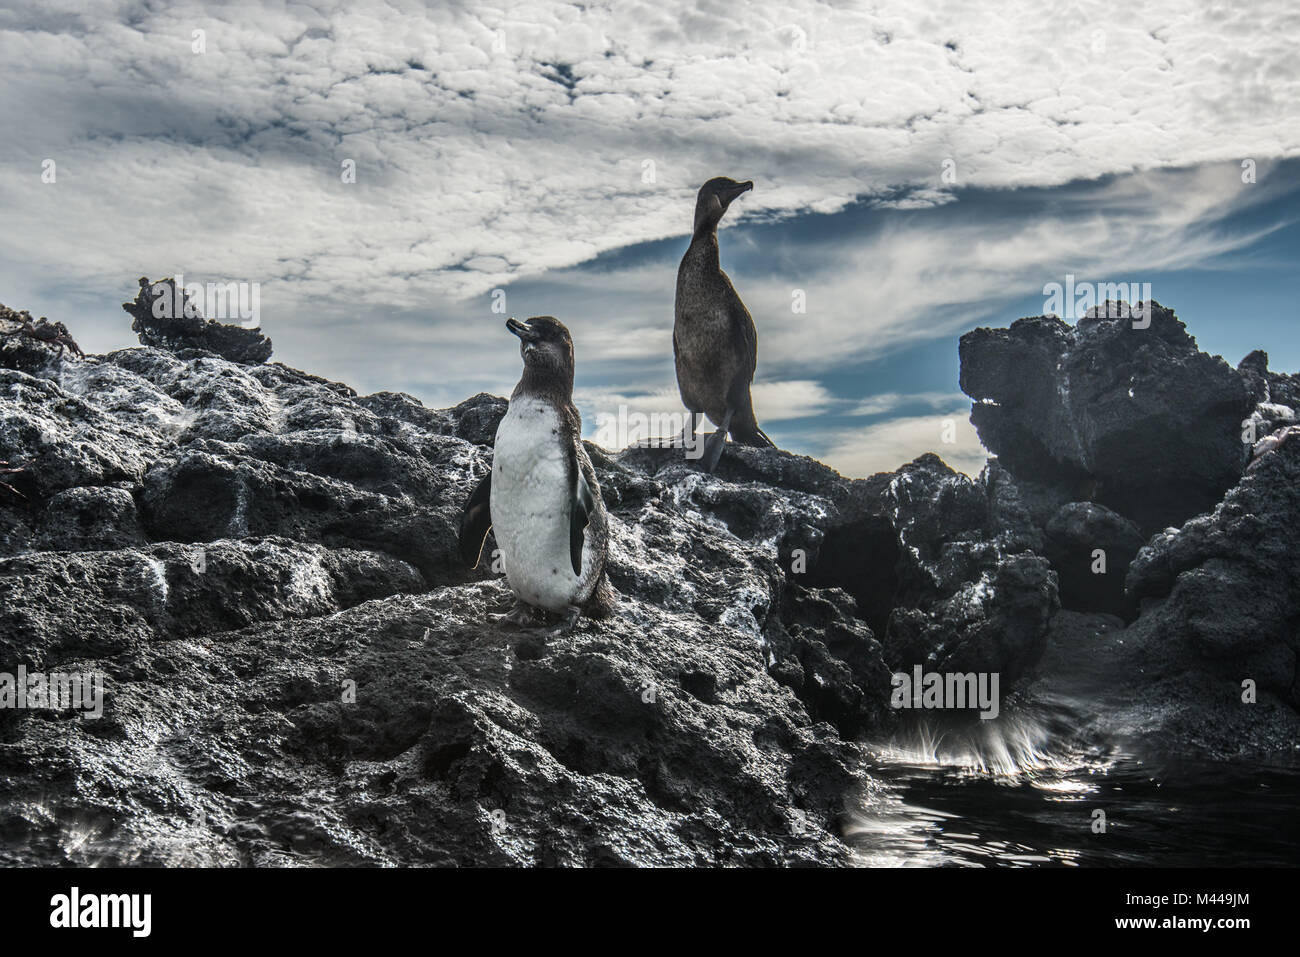 Le Galapagos Penguin e Flightless Cormorant in appoggio sulle rocce, Seymour, Galapagos, Ecuador Immagini Stock